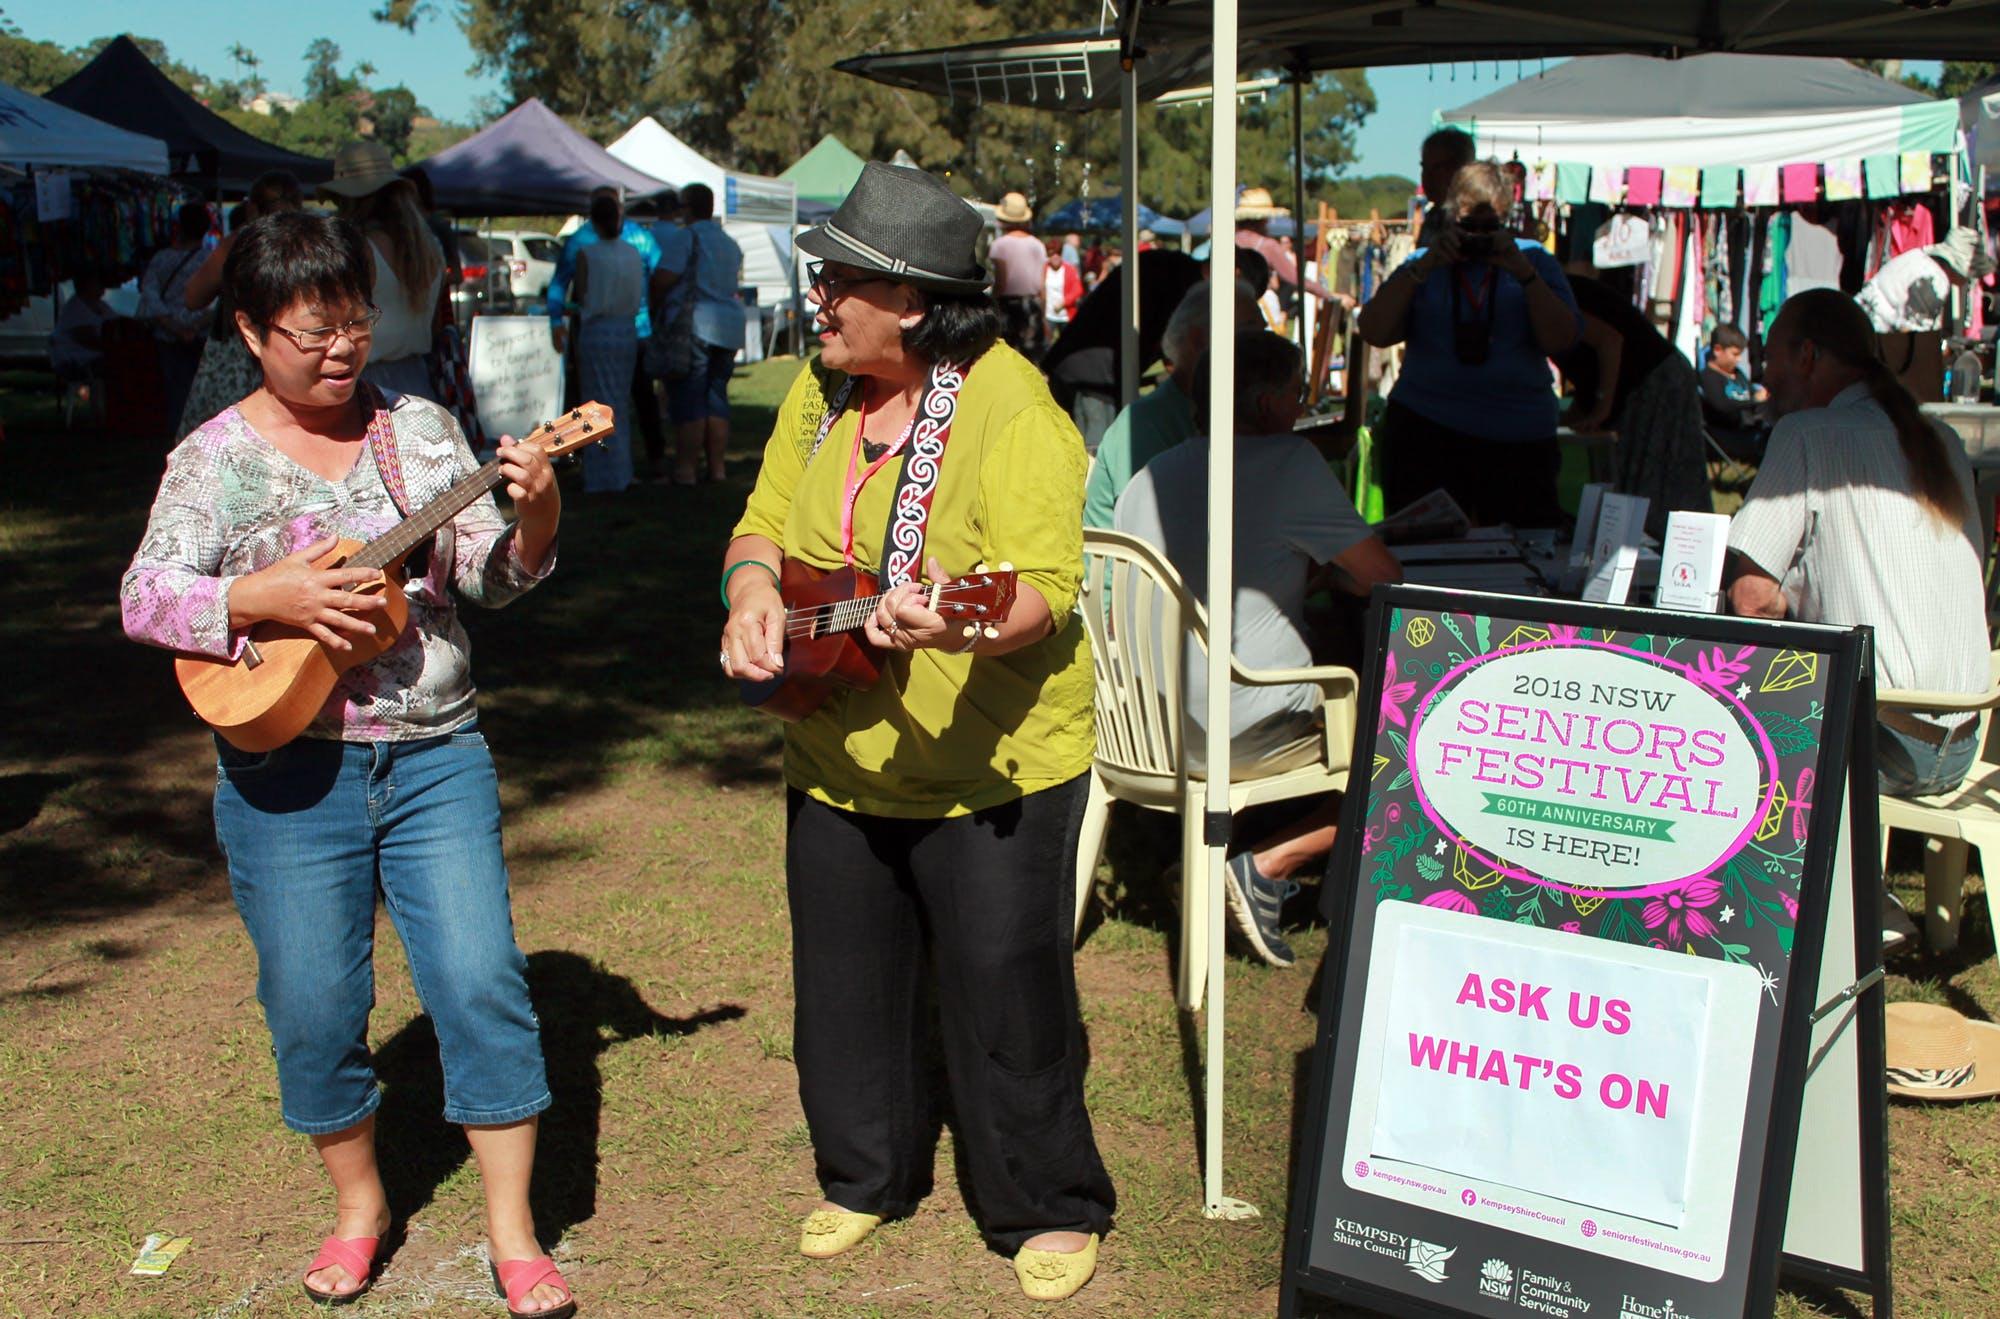 Seniors Festival Stall at Kempsey Riverside Markets